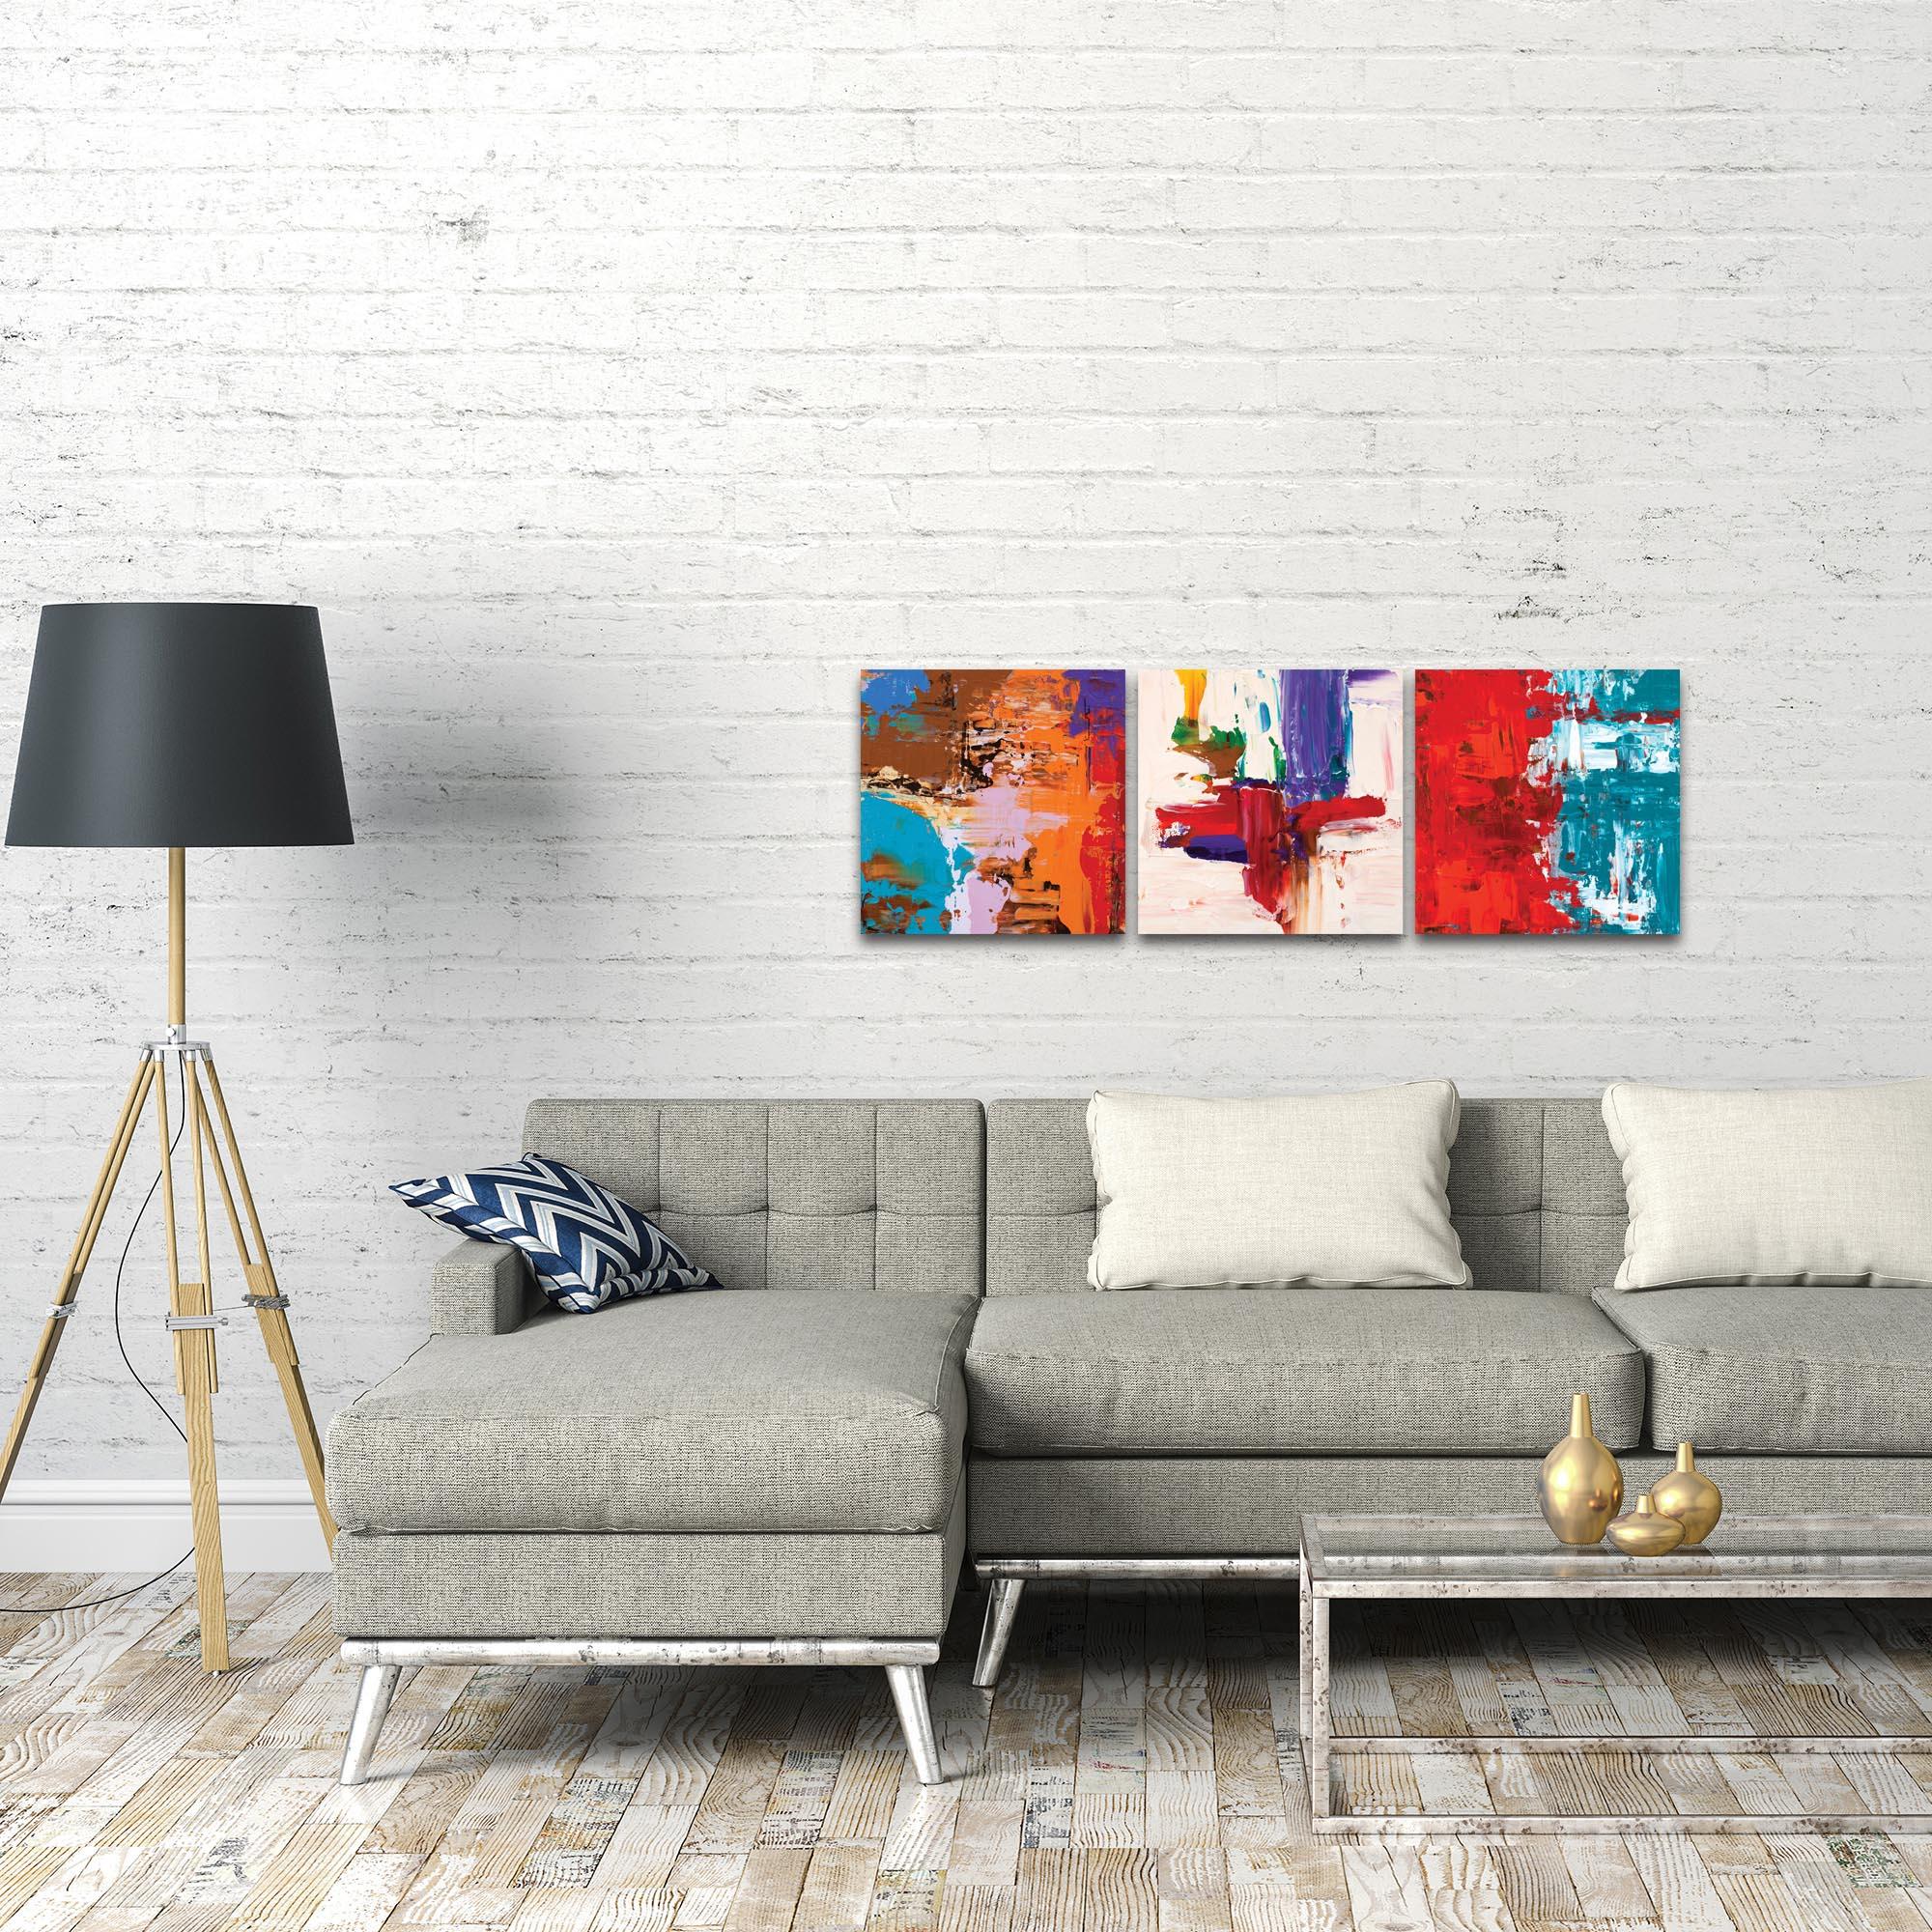 Abstract Wall Art 'Urban Triptych 5' - Urban Decor on Metal or Plexiglass - Lifestyle View